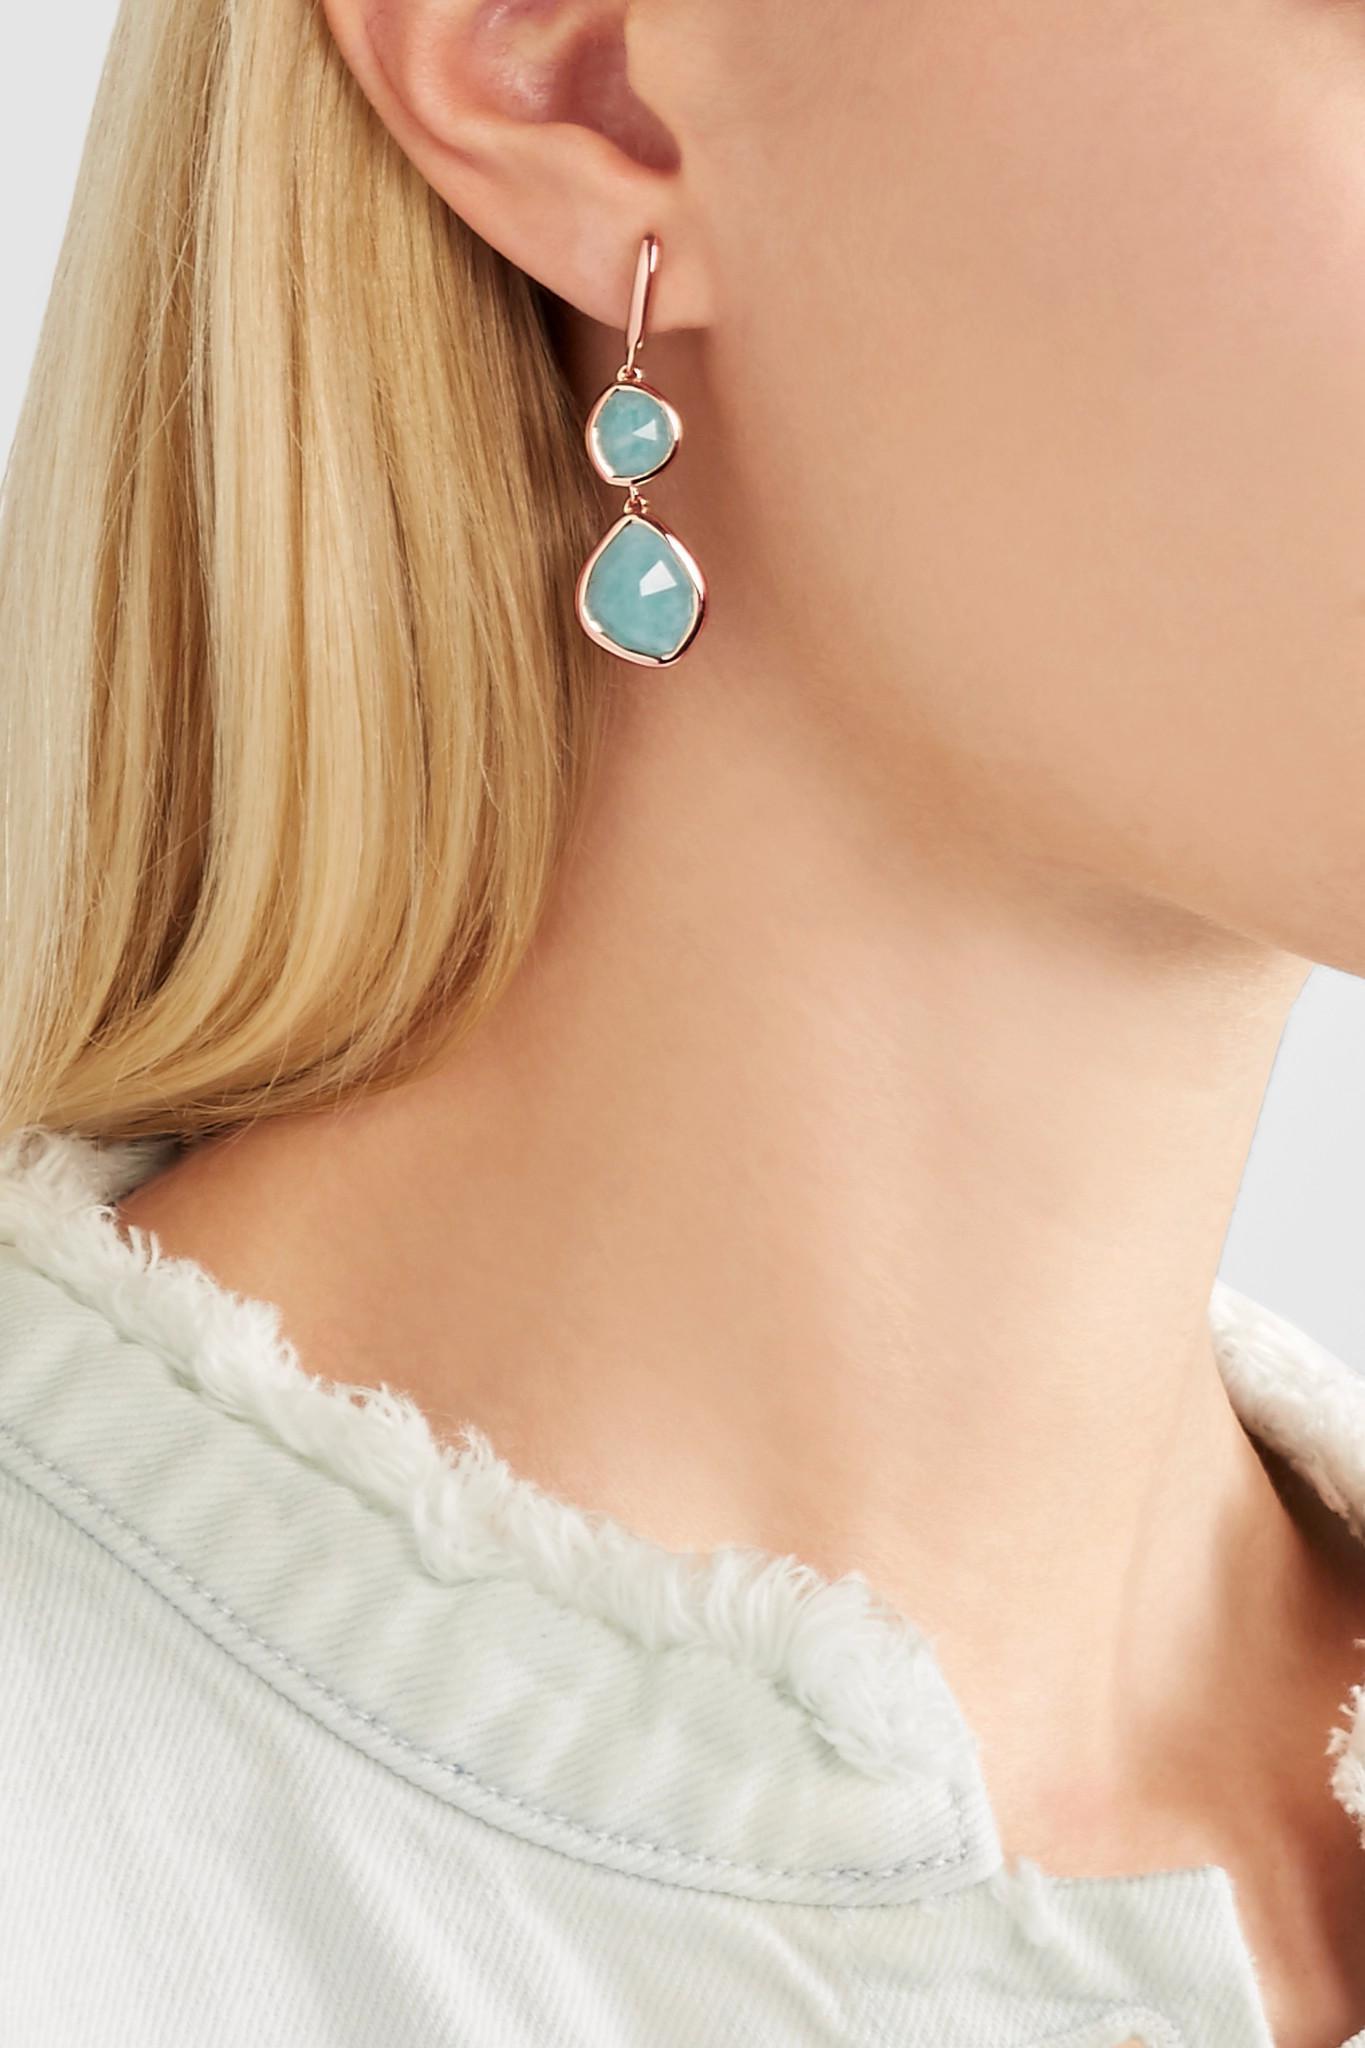 Rose Gold Siren Wire Earrings Amazonite Monica Vinader jjBQQ0Ies8